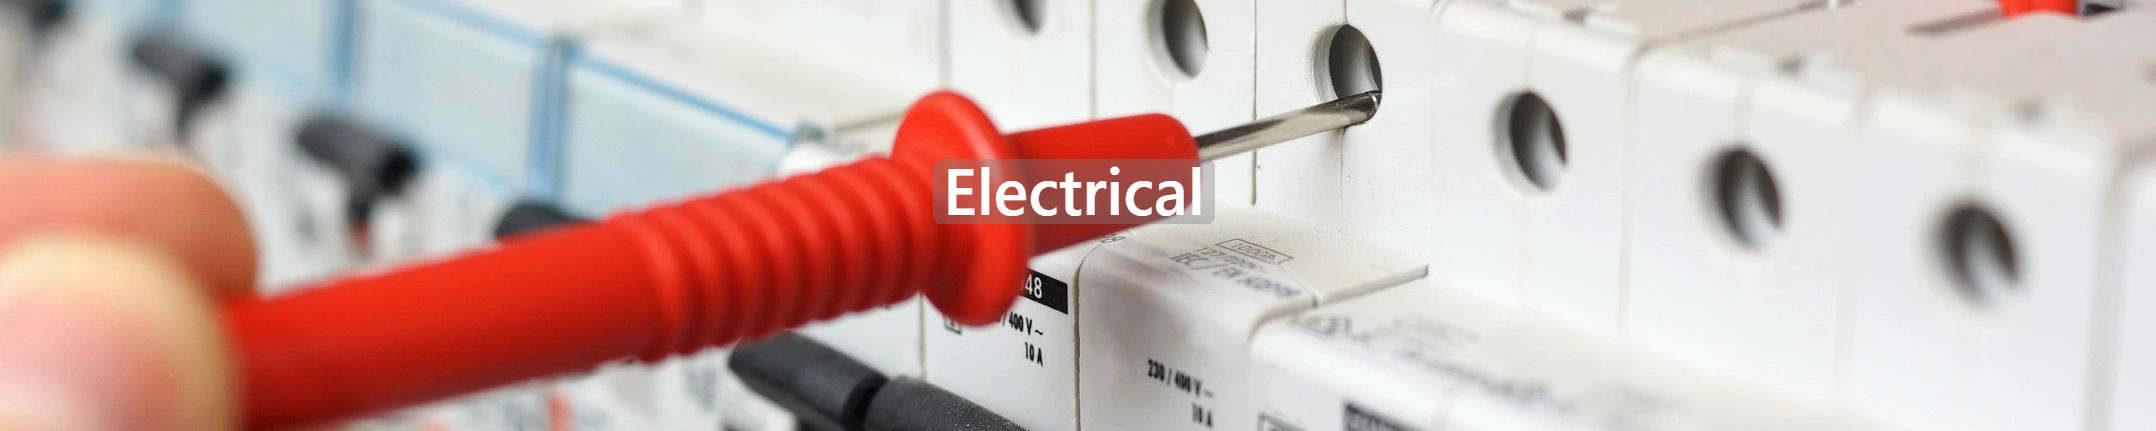 electronic calibration electrical calibration services images acs calibration laboratory acs calibration company alabama